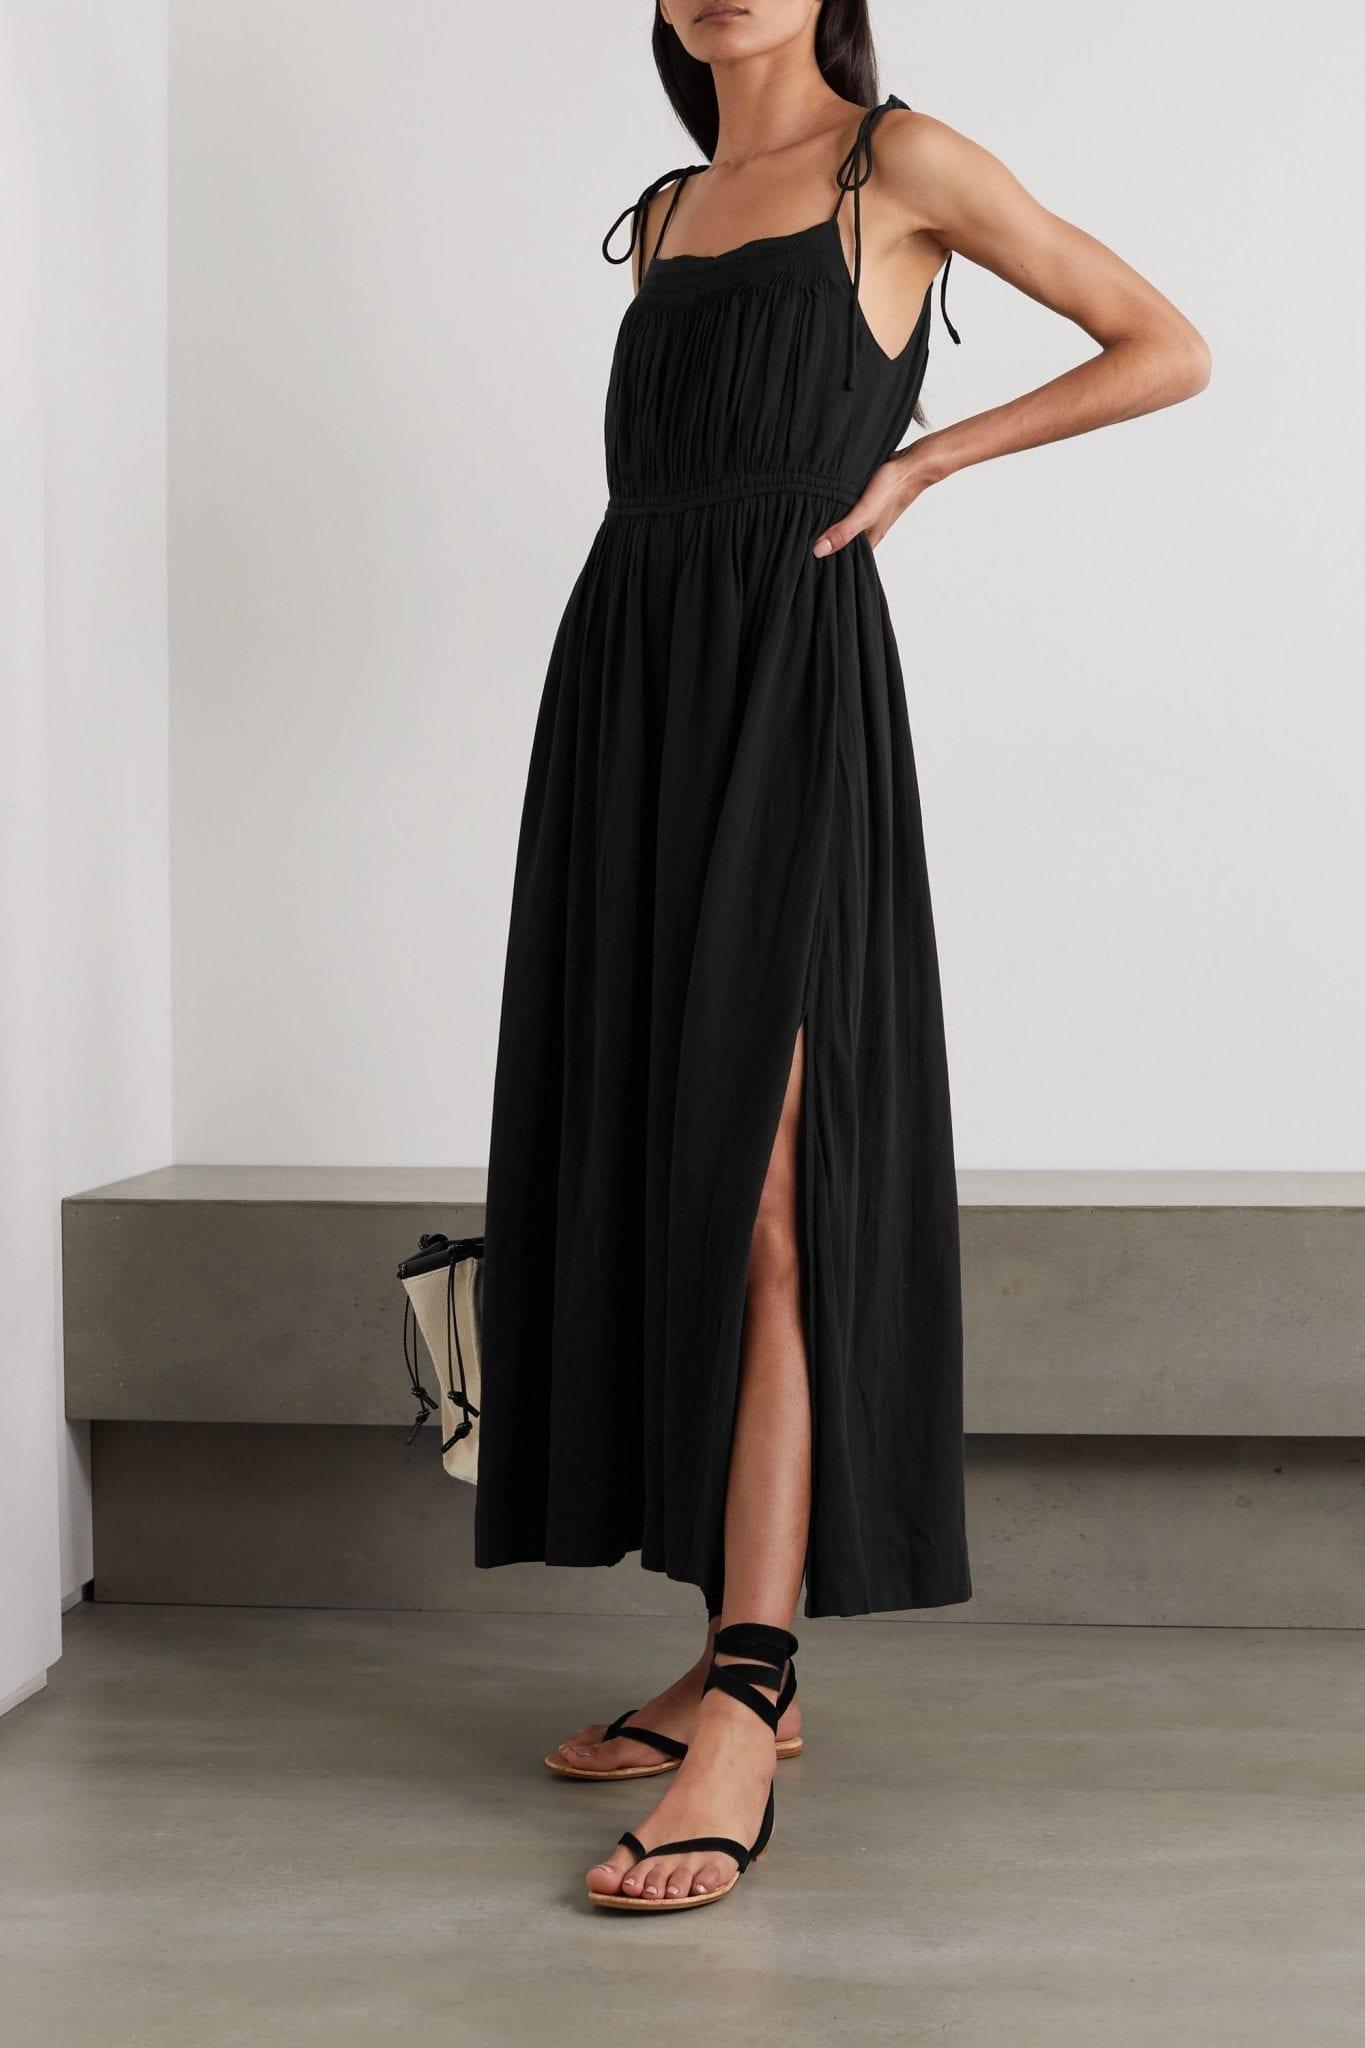 APIECE APART Cecile Tie-detailed Gathered Organic Cotton Midi Dress